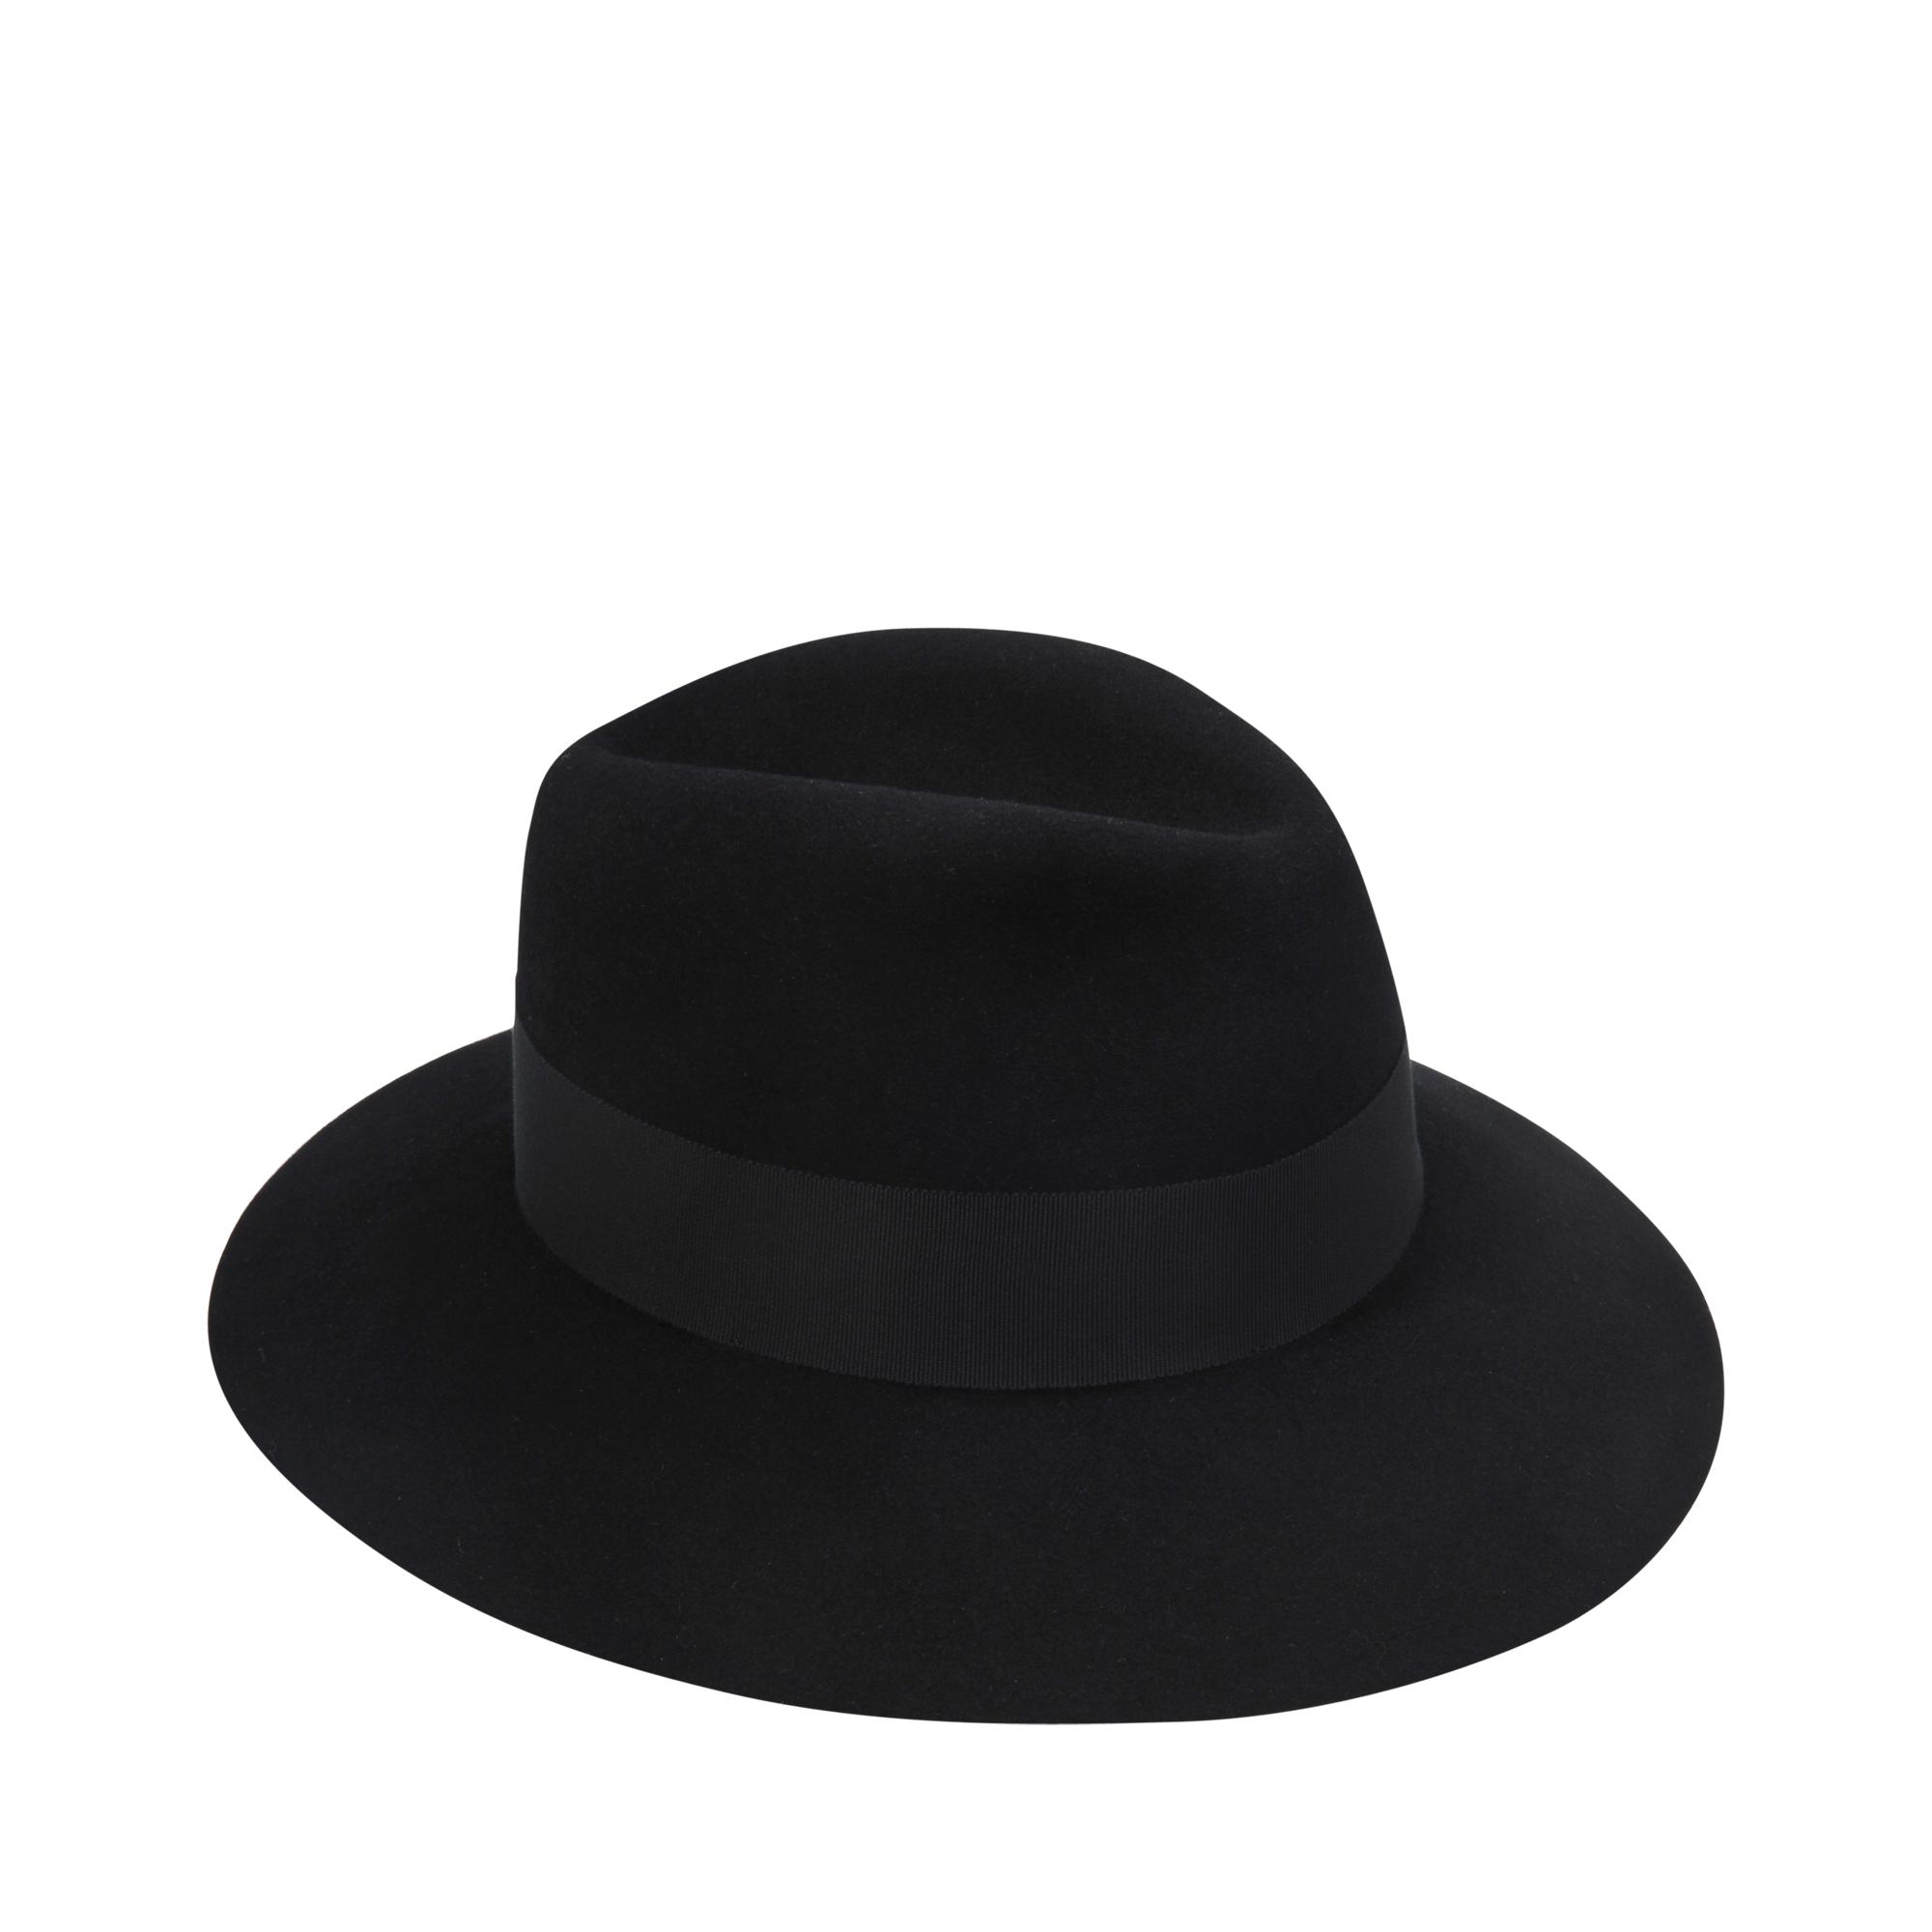 Lyst maison michel henrietta felt hat in black for Maison michel